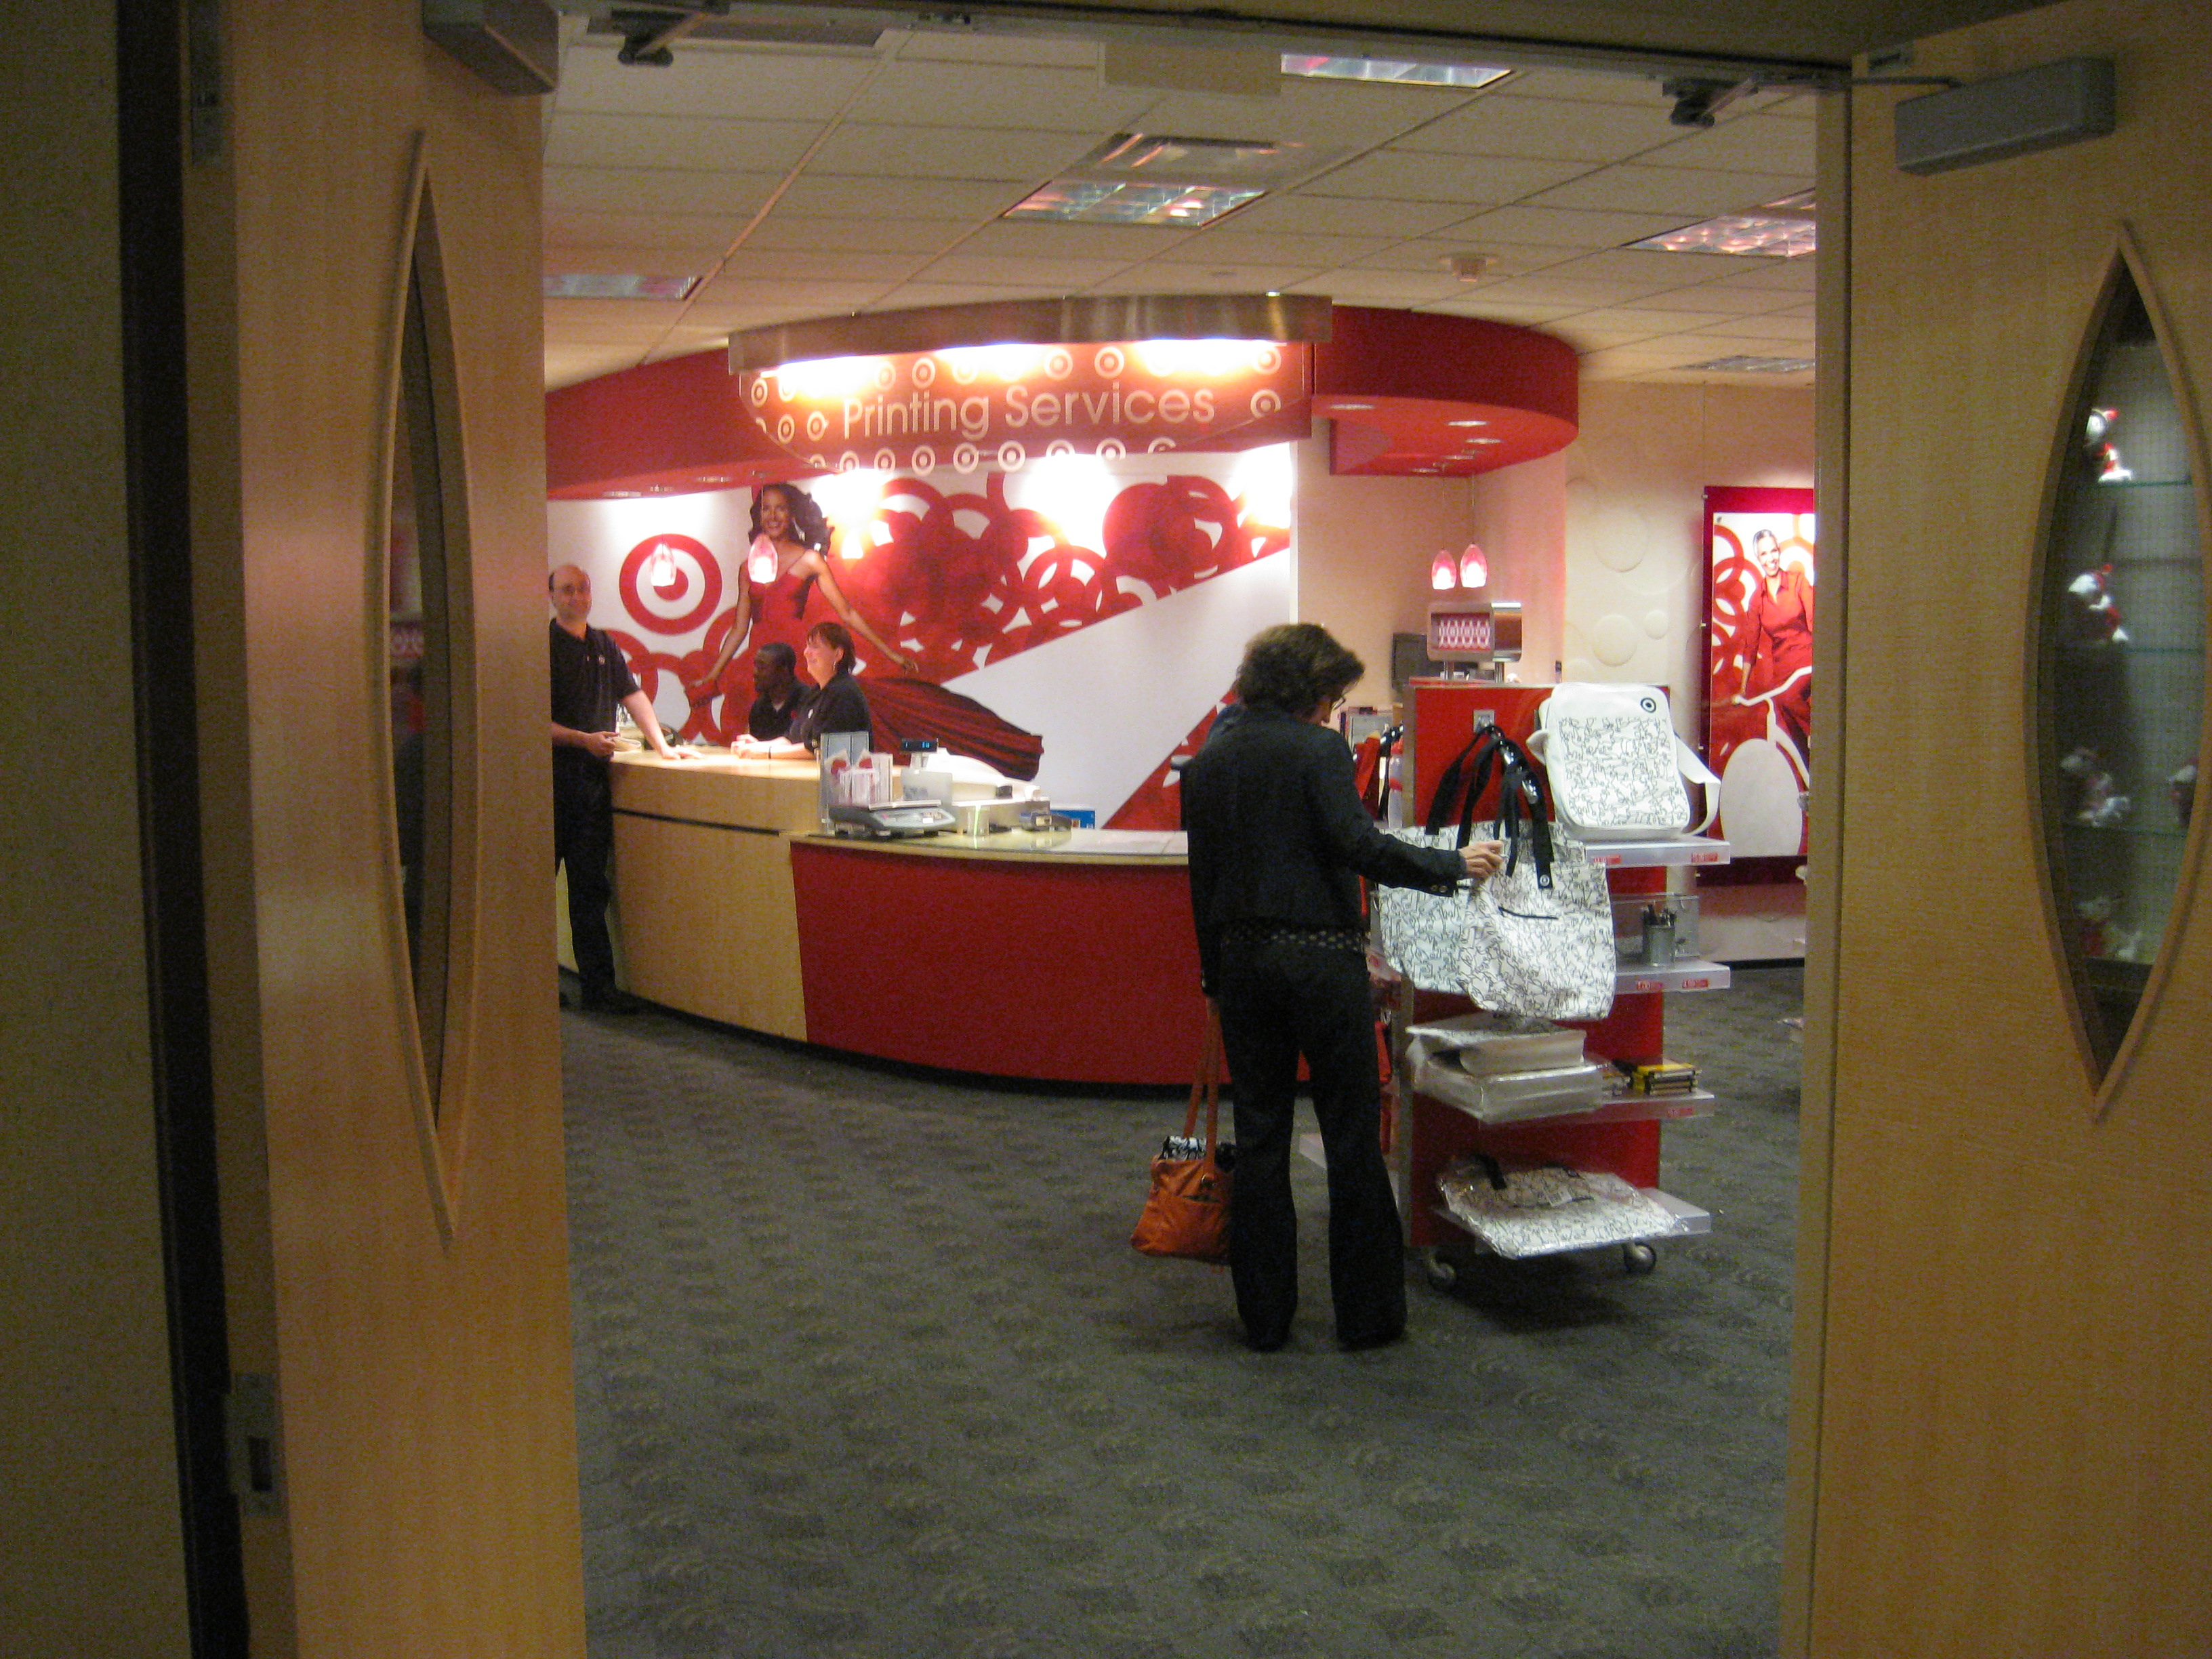 Target corporate headquarters tour